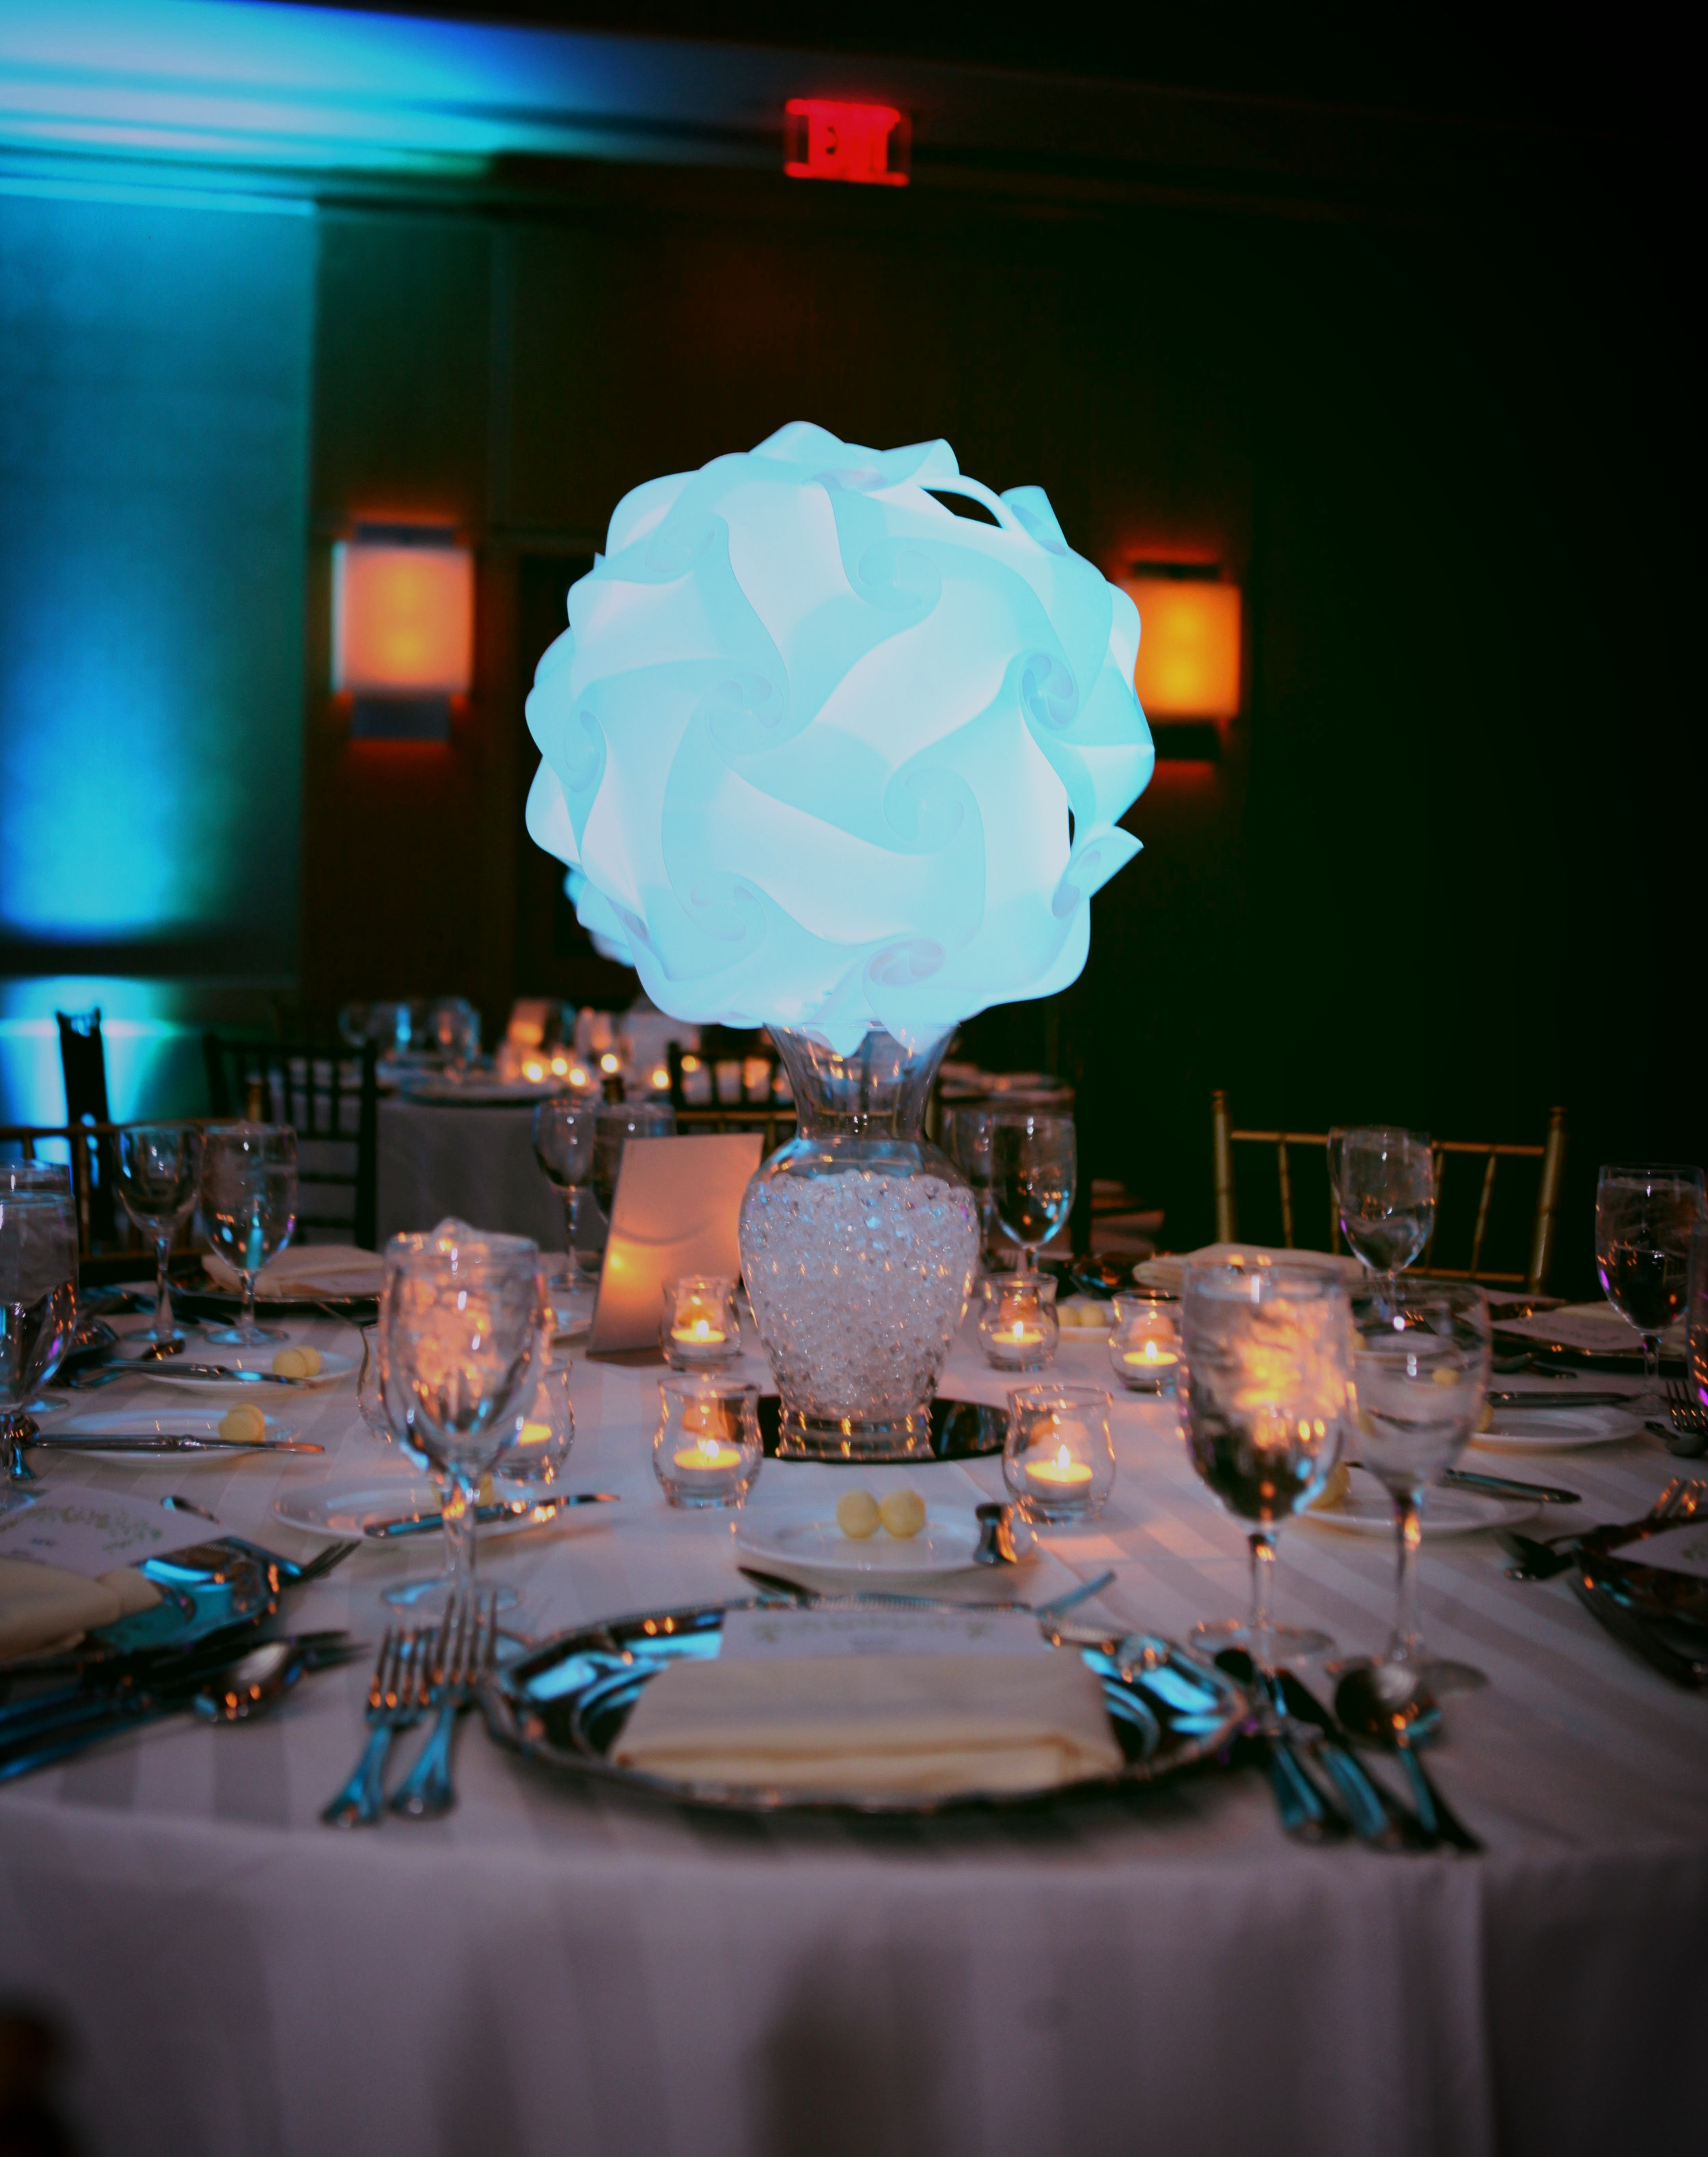 LED SPHERES / CENTERPIECES -